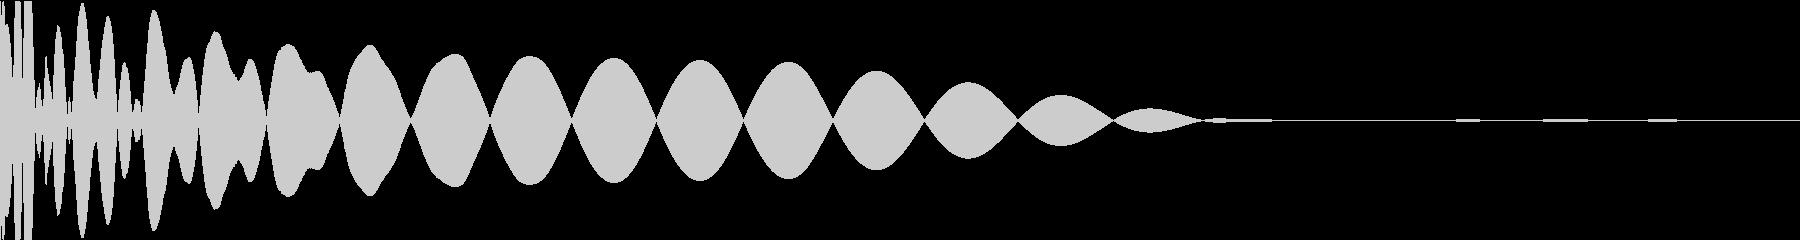 DTM Kick 7 オリジナル音源の未再生の波形